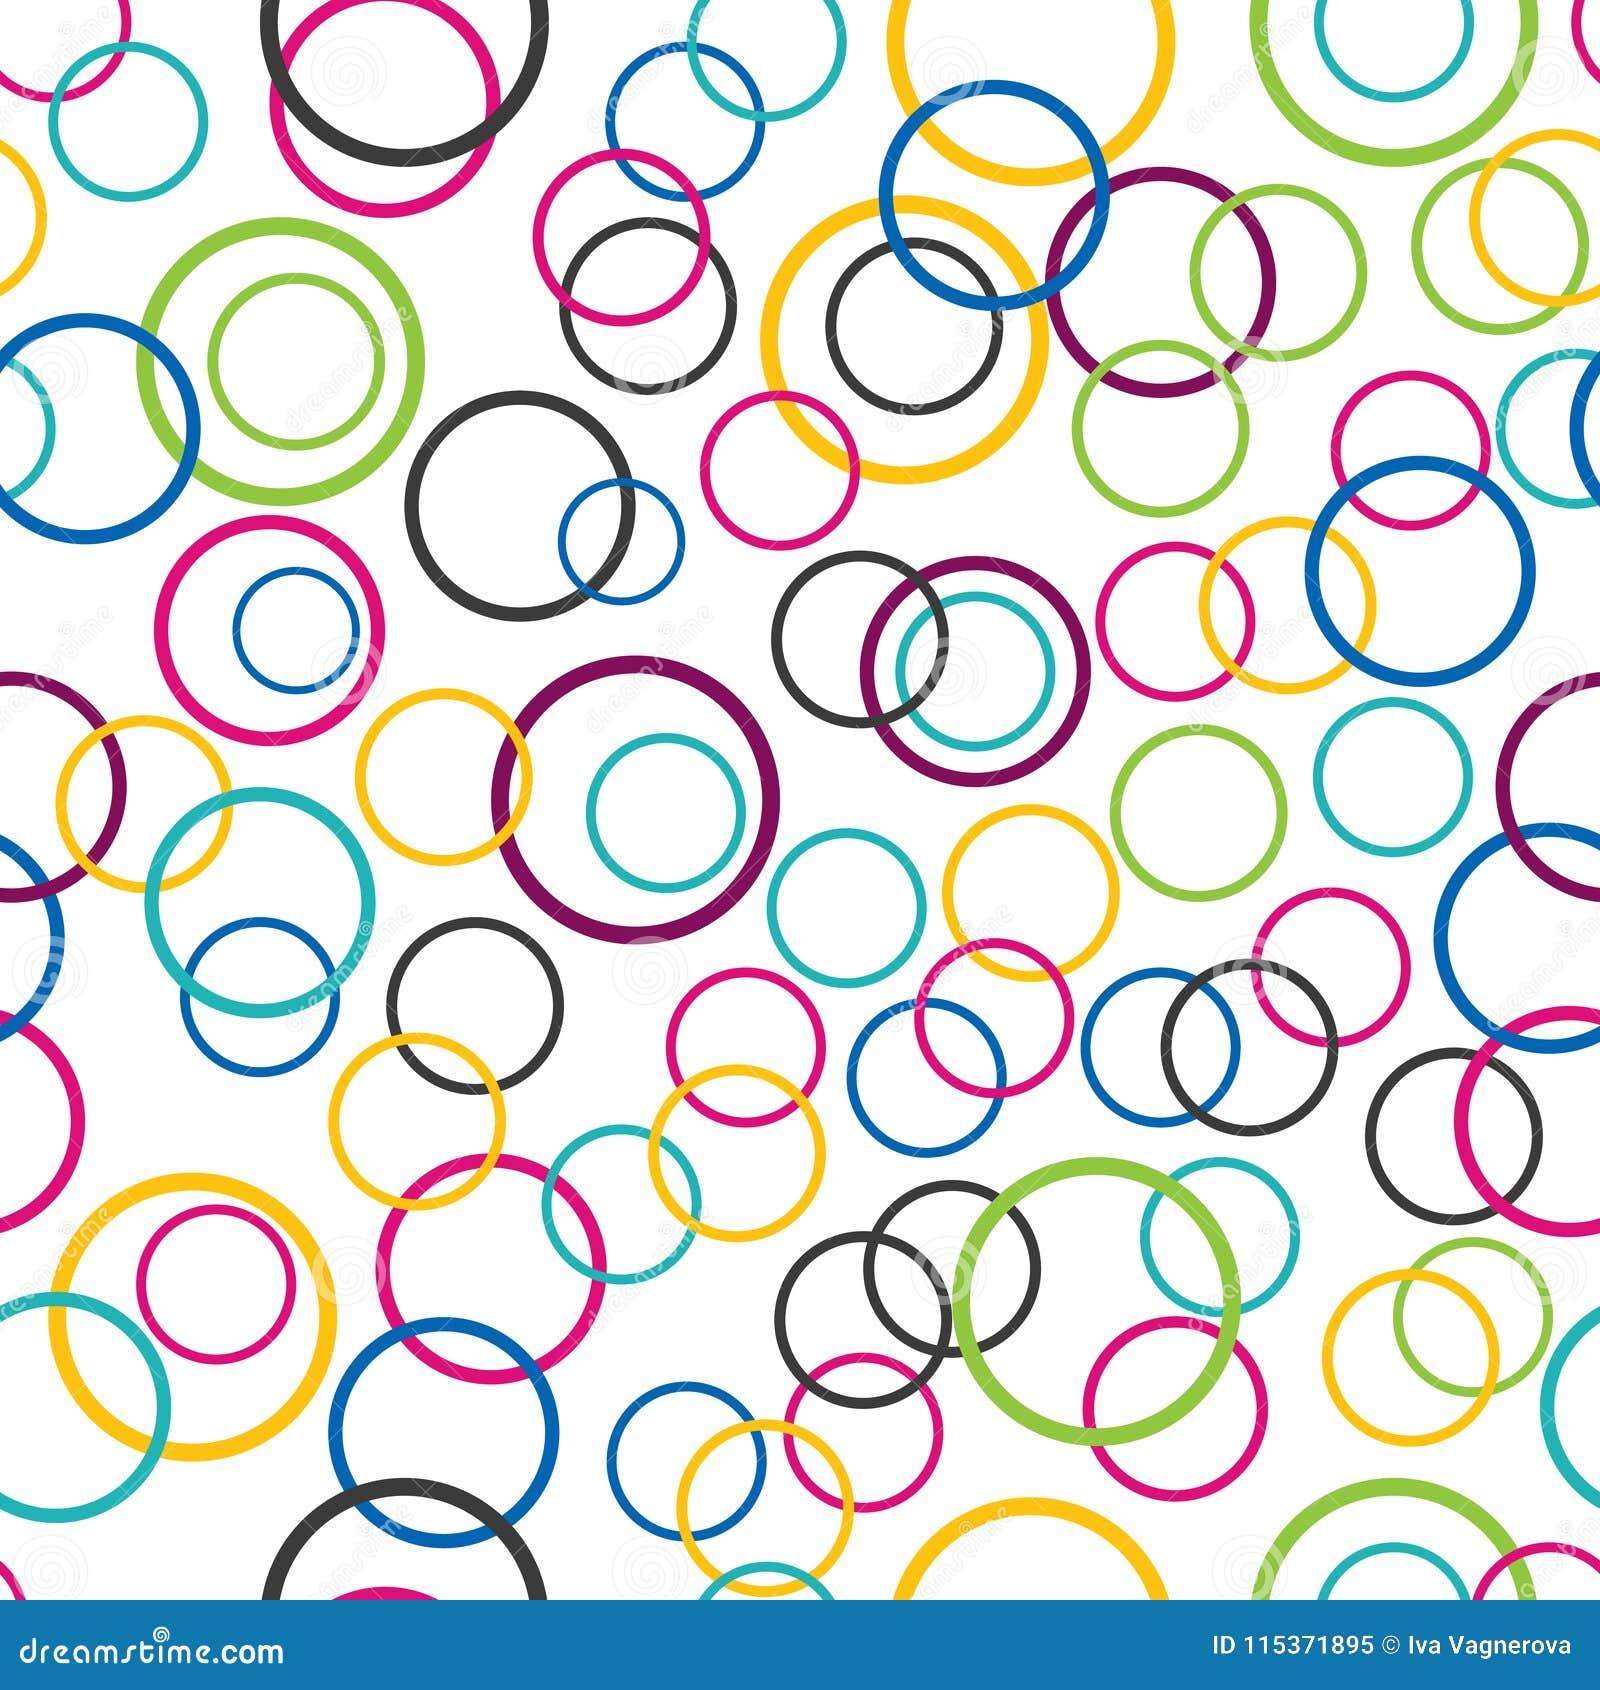 Abstracte naadloze achtergrond, cirkelringen op witte achtergrond